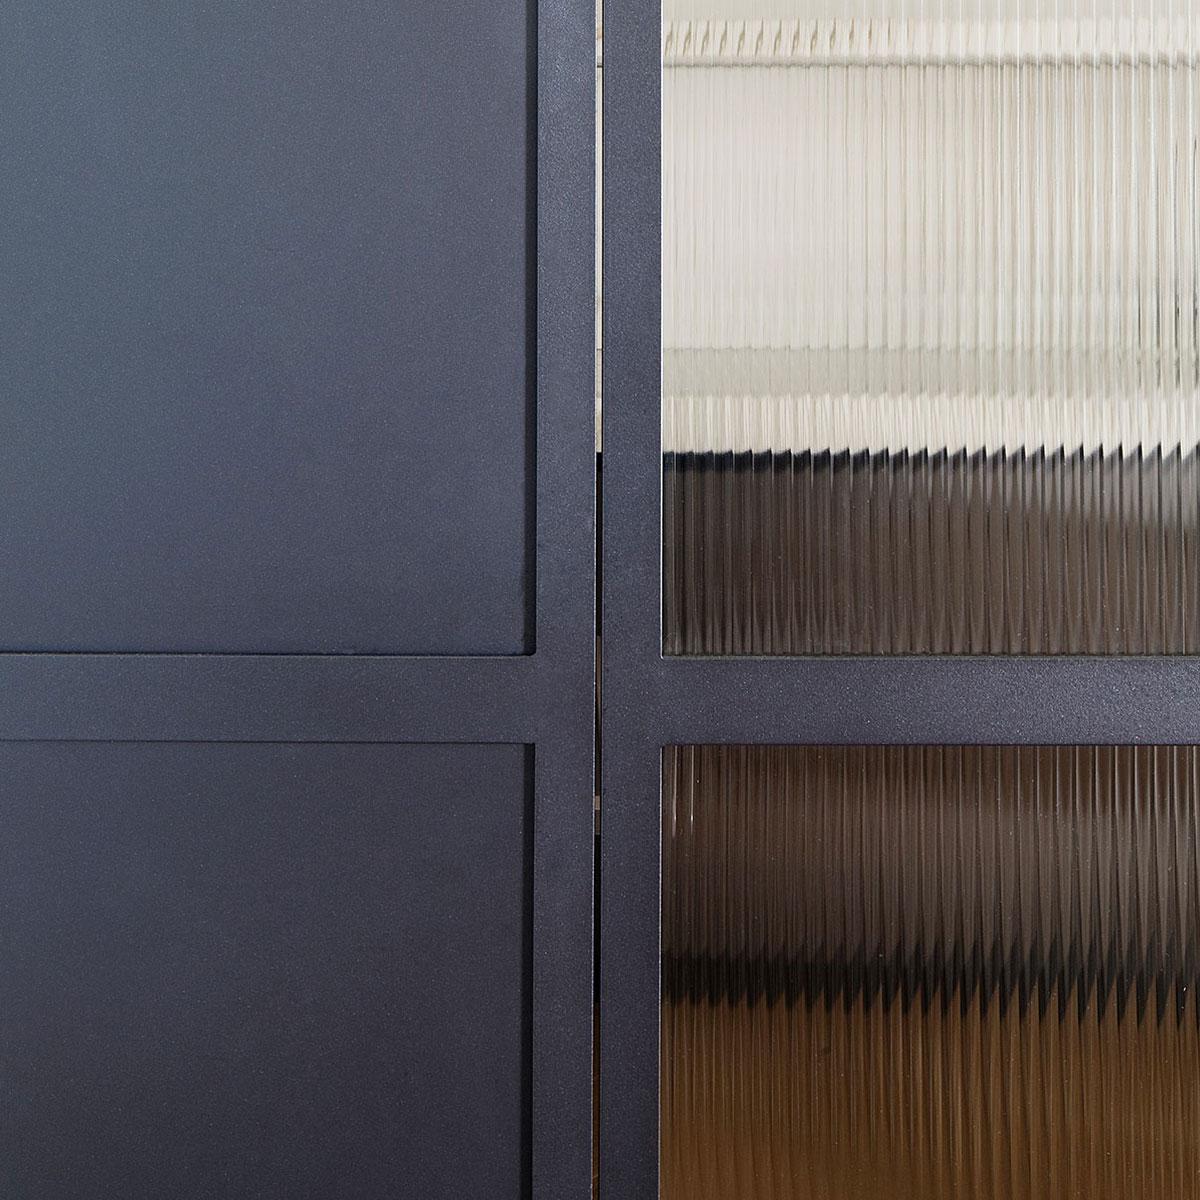 kickoffice casa dgr detail kitchen ribbed glass steel door